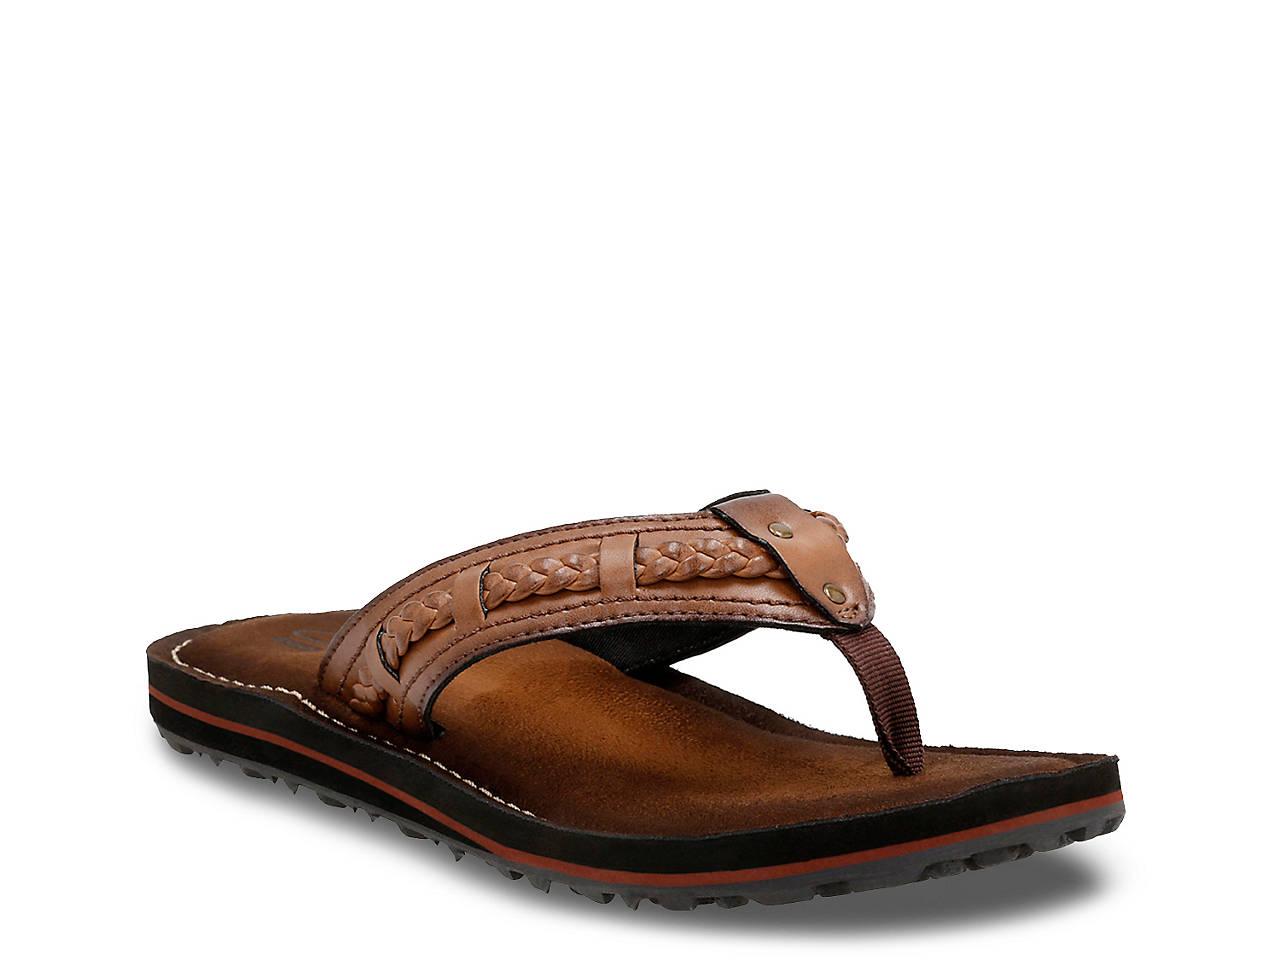 e5c62641f0f Clarks Fenner Nerice Flat Sandal Women s Shoes